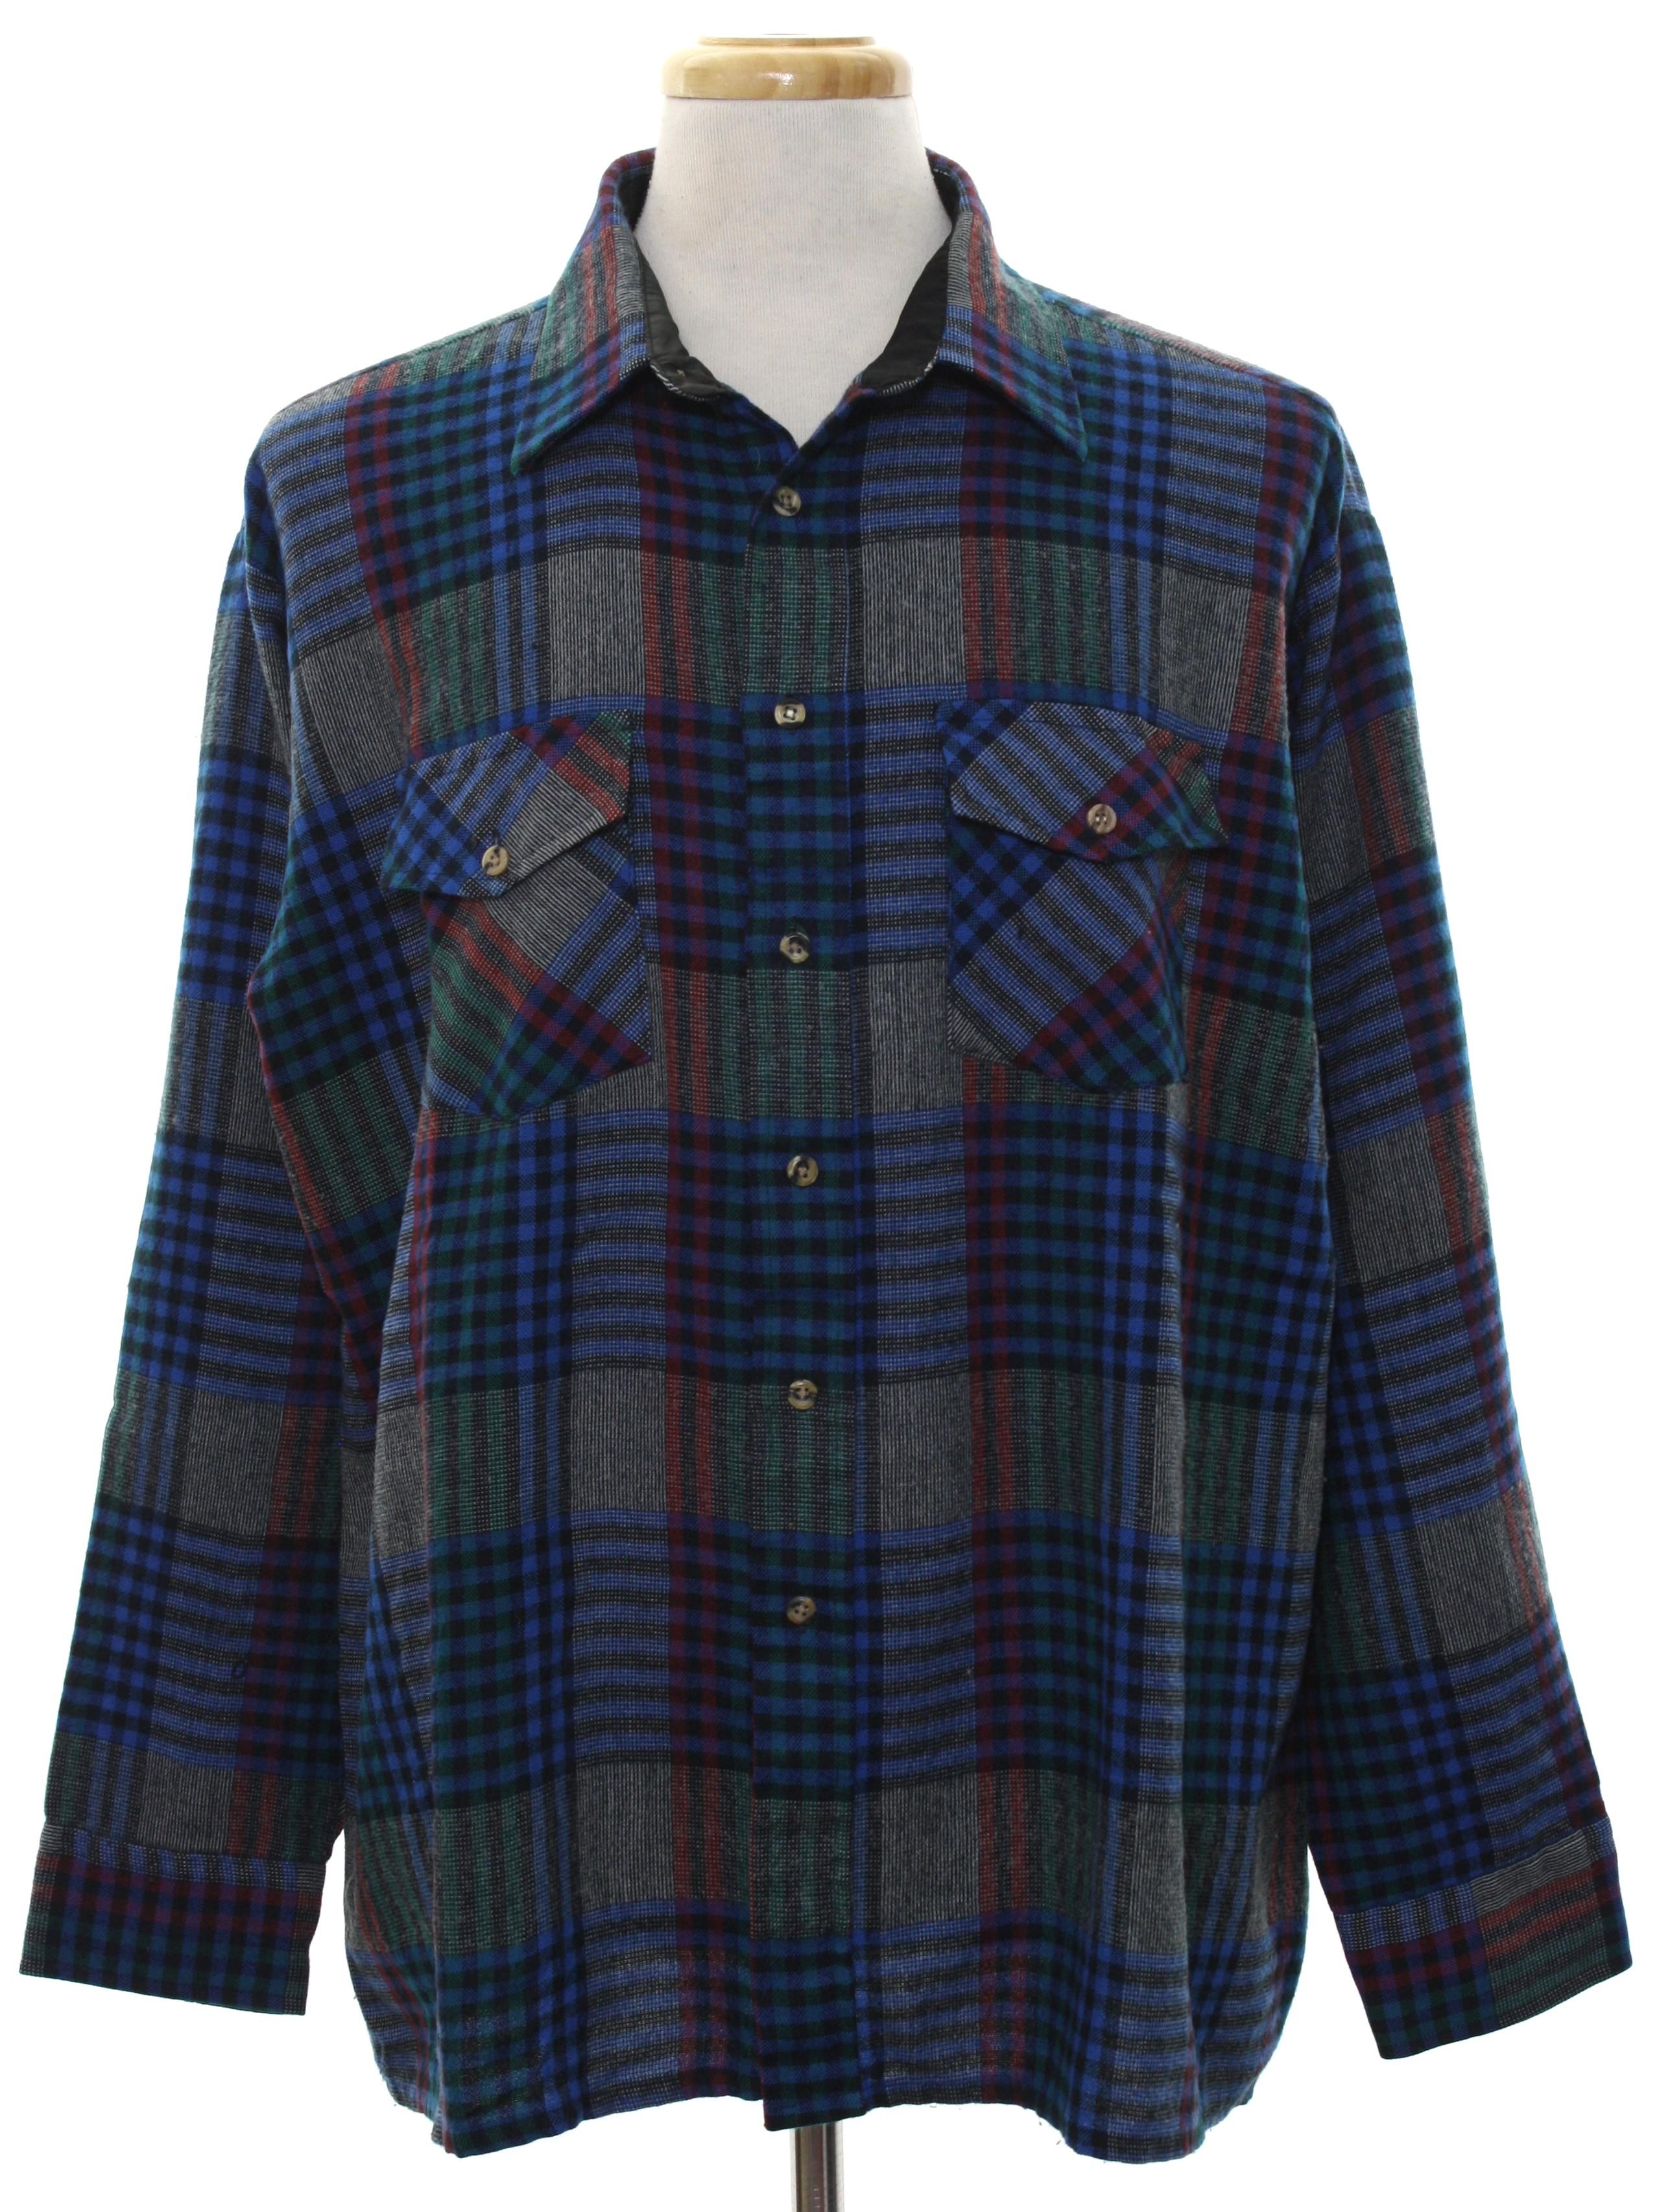 Vintage 1980 39 s shirt 80s van heusen mens navy blue for Van heusen plaid shirts